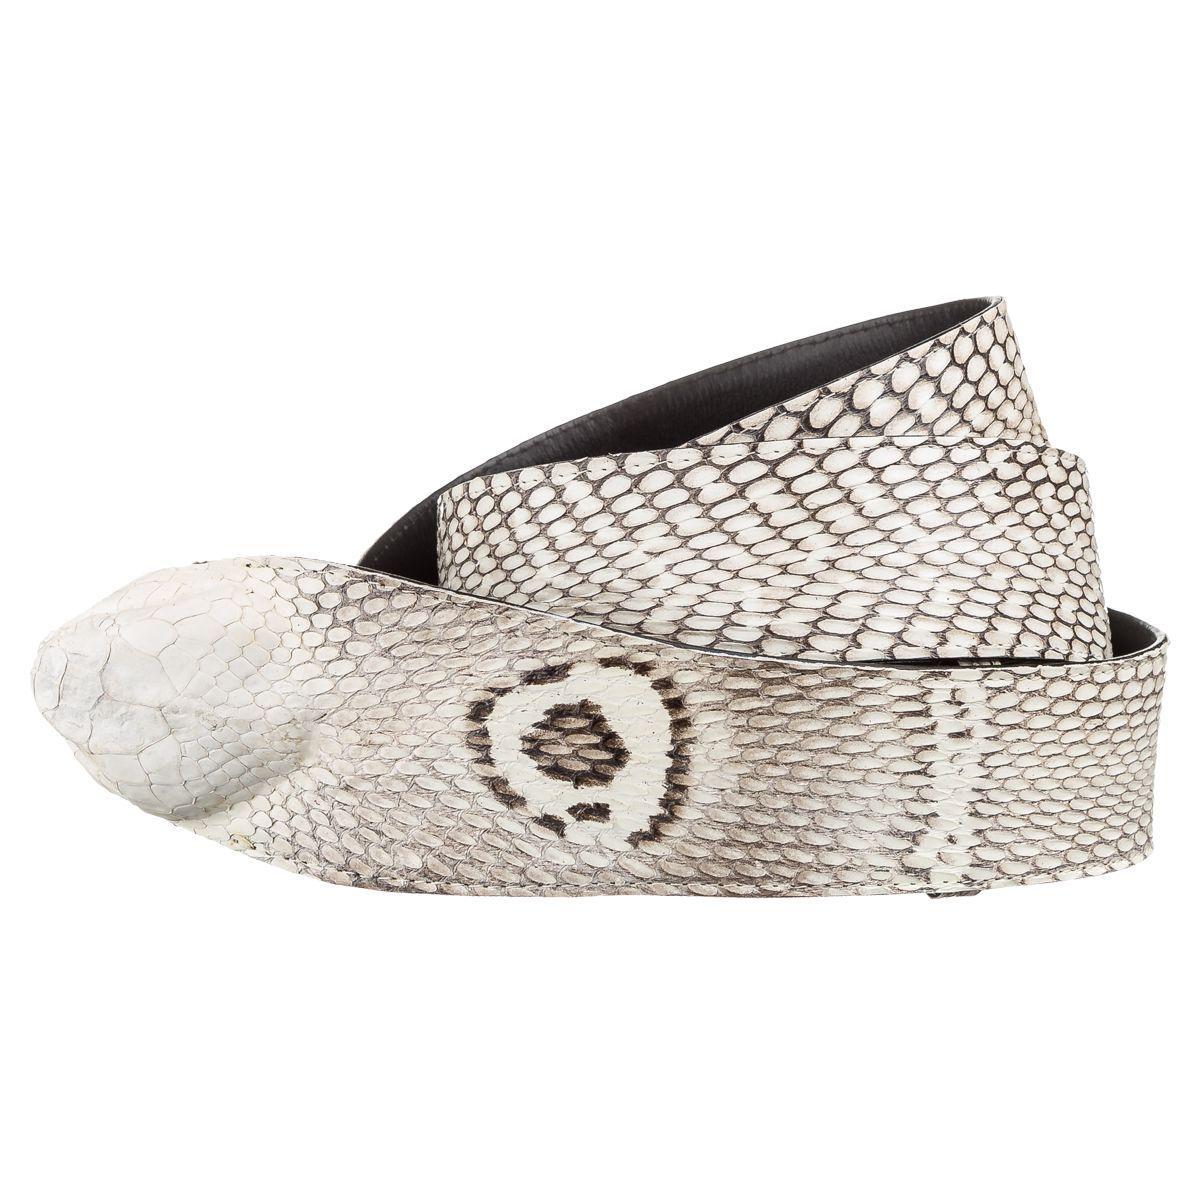 Ремень Snake Leather 18199 Из Натуральной Кожи Кобры Белый, Белый